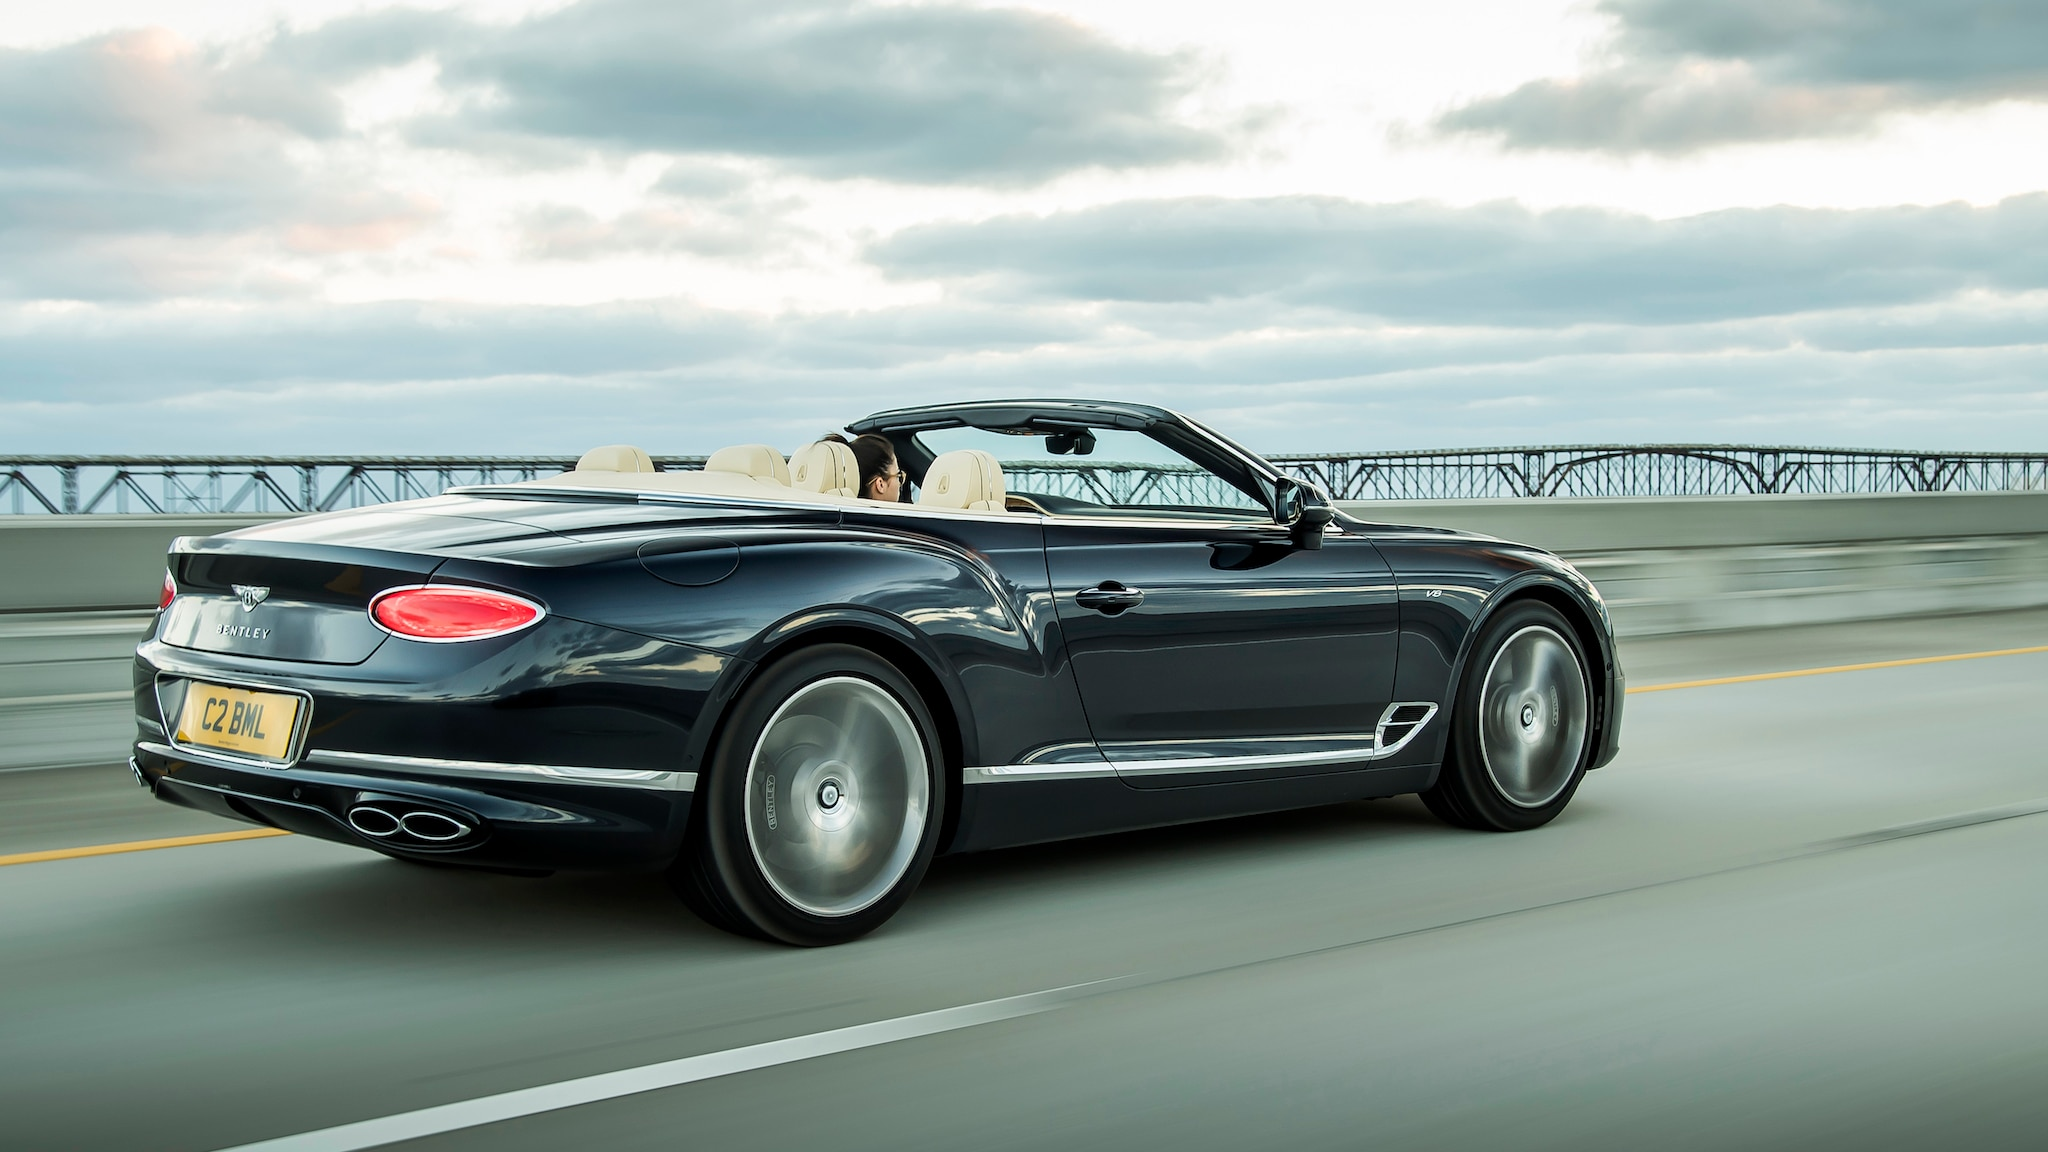 Bentley Continental GT Convertible V8 8 1